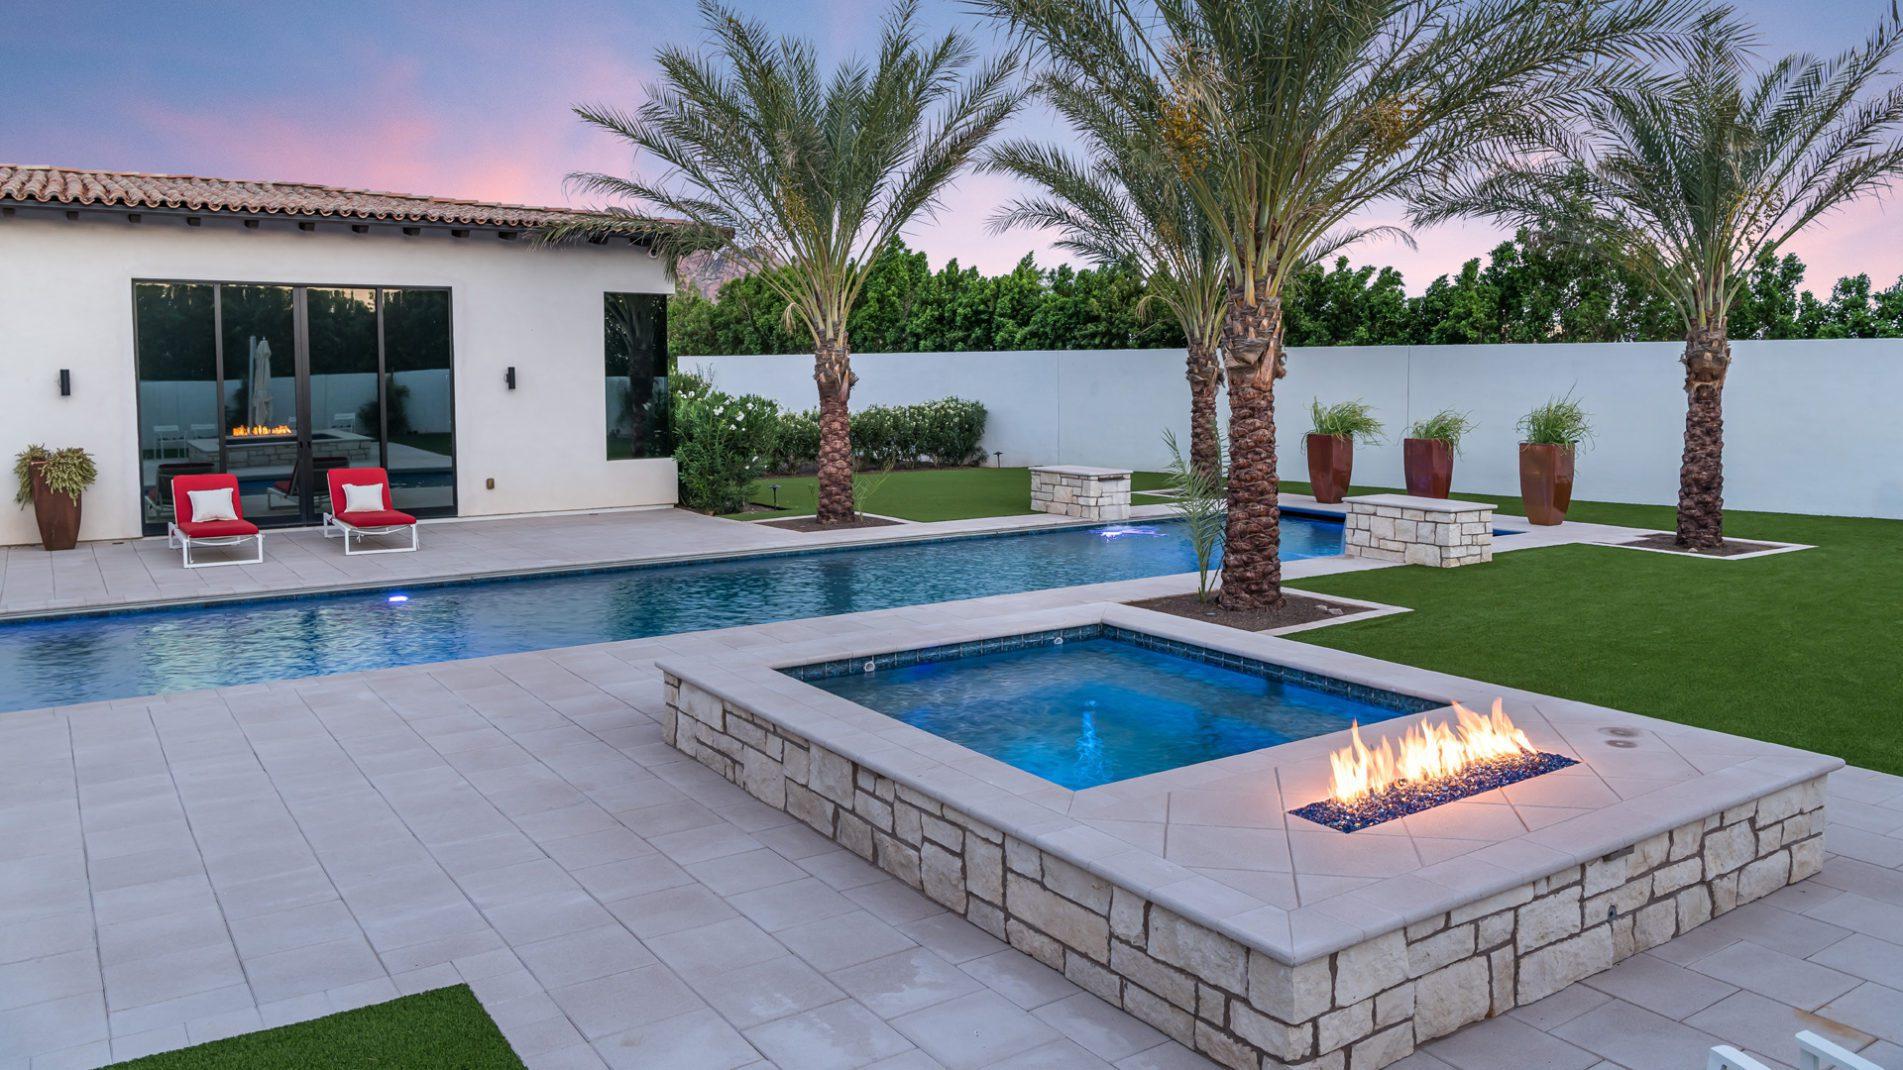 Swimming Pool Laps In Paradise